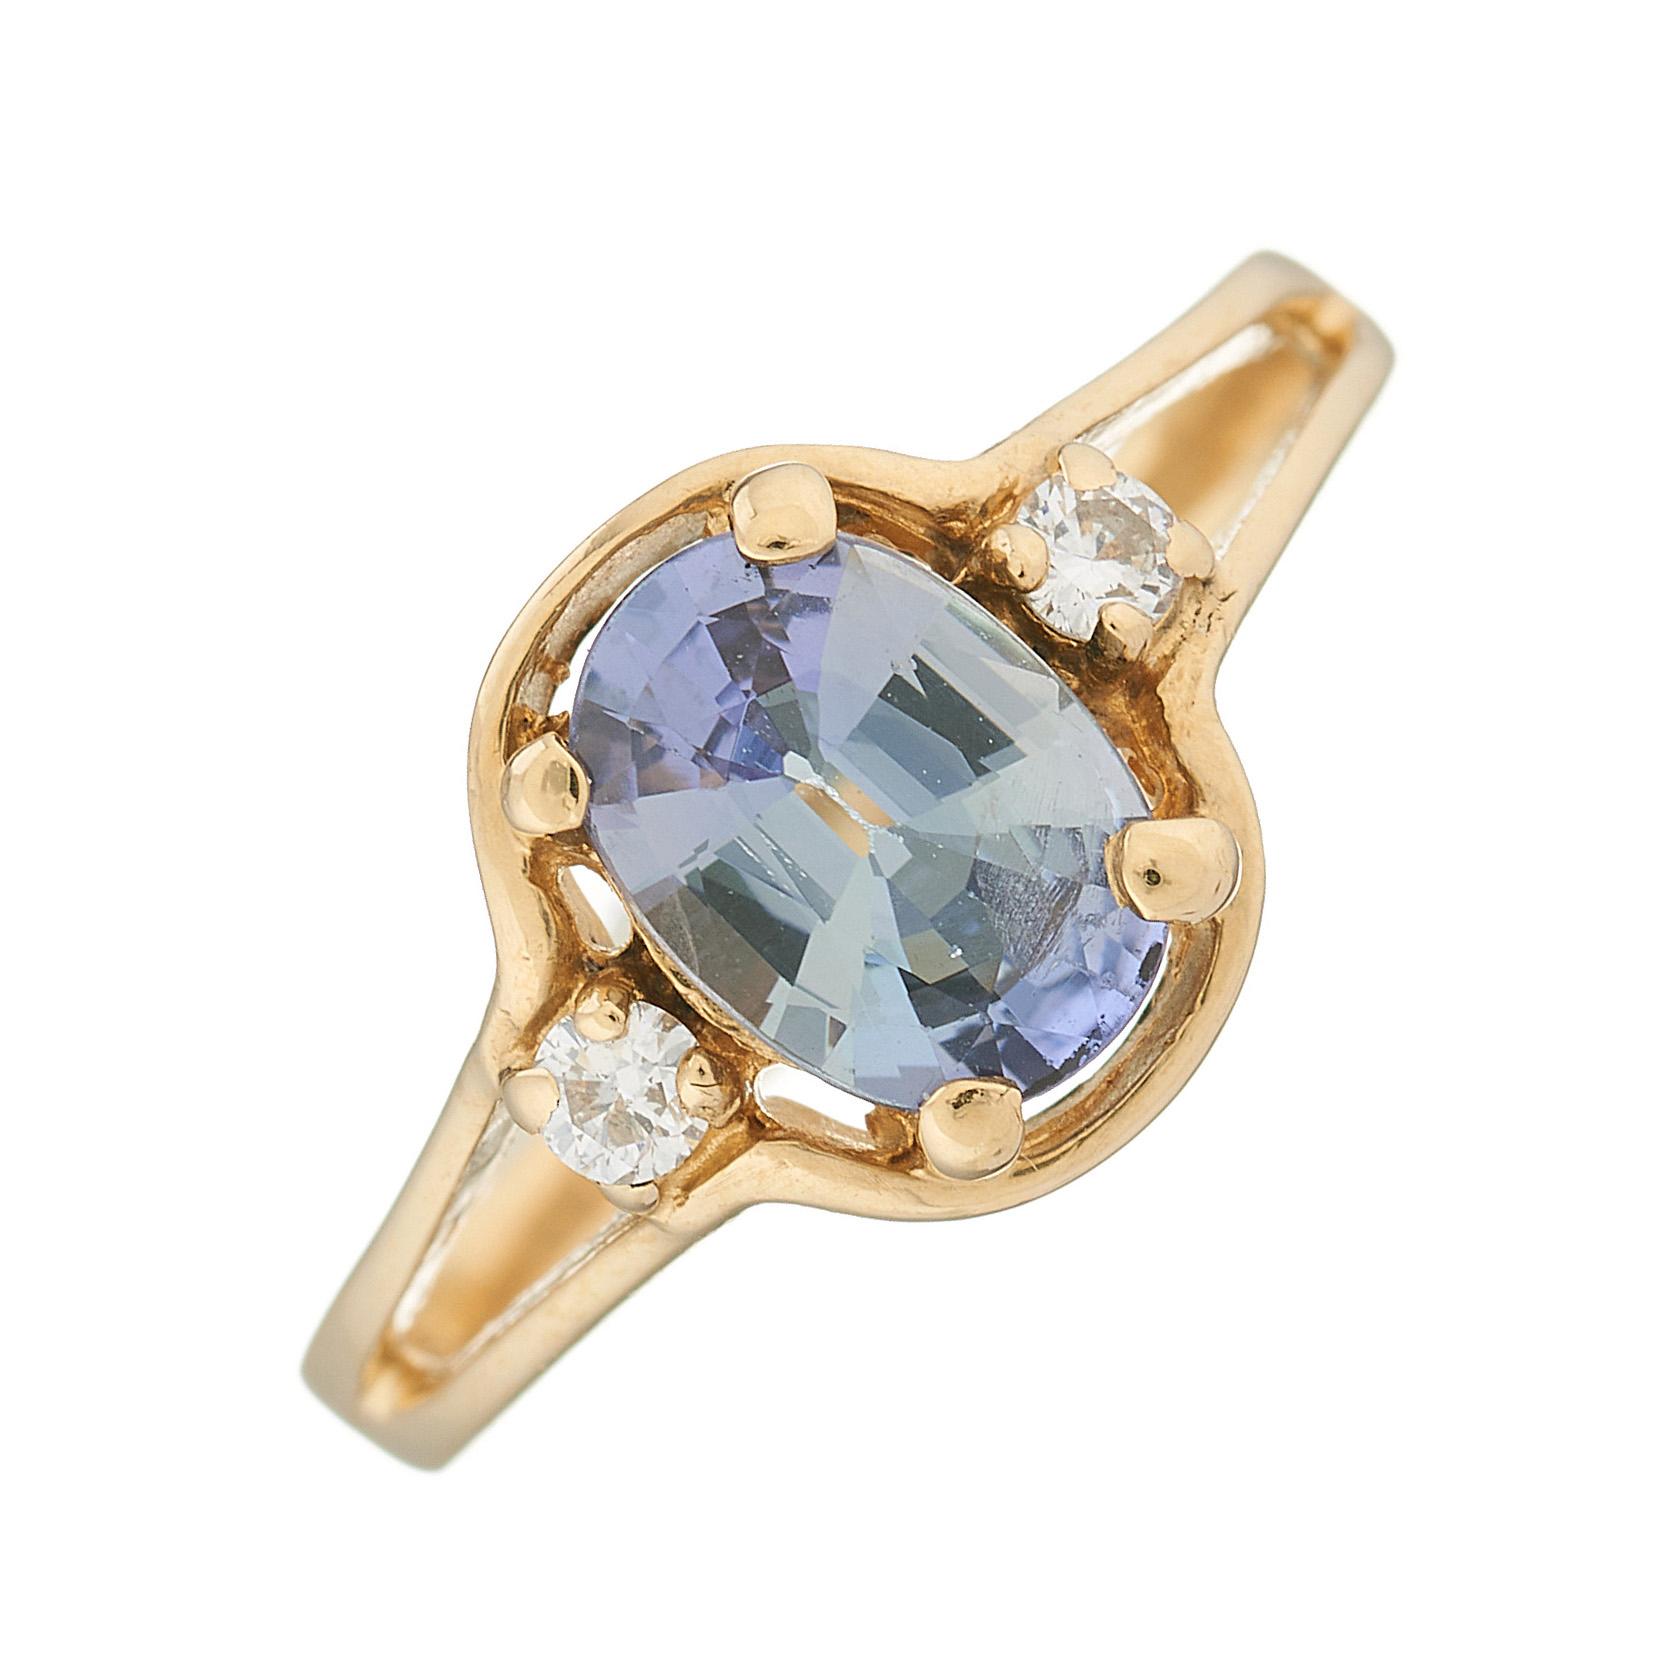 A 14ct gold tanzanite and diamond three-stone ring